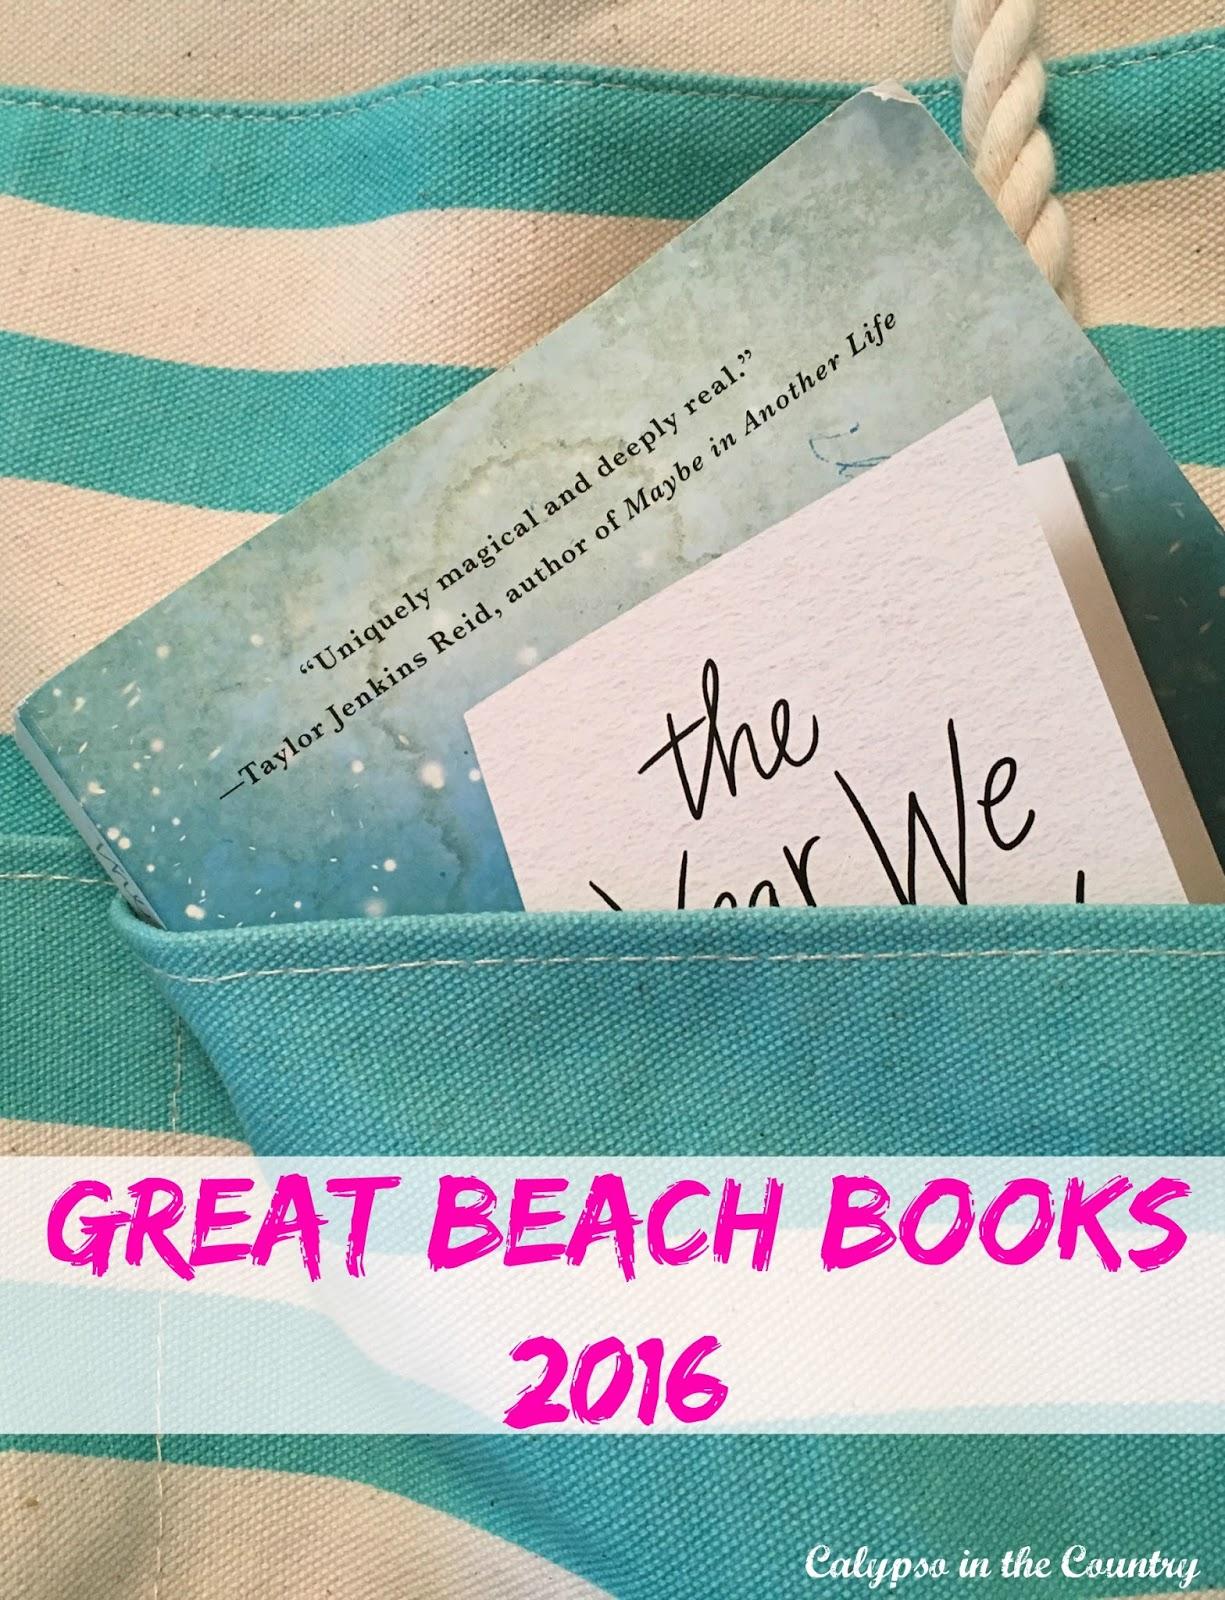 Great Beach Books 2016 - Fun books to read this summer!